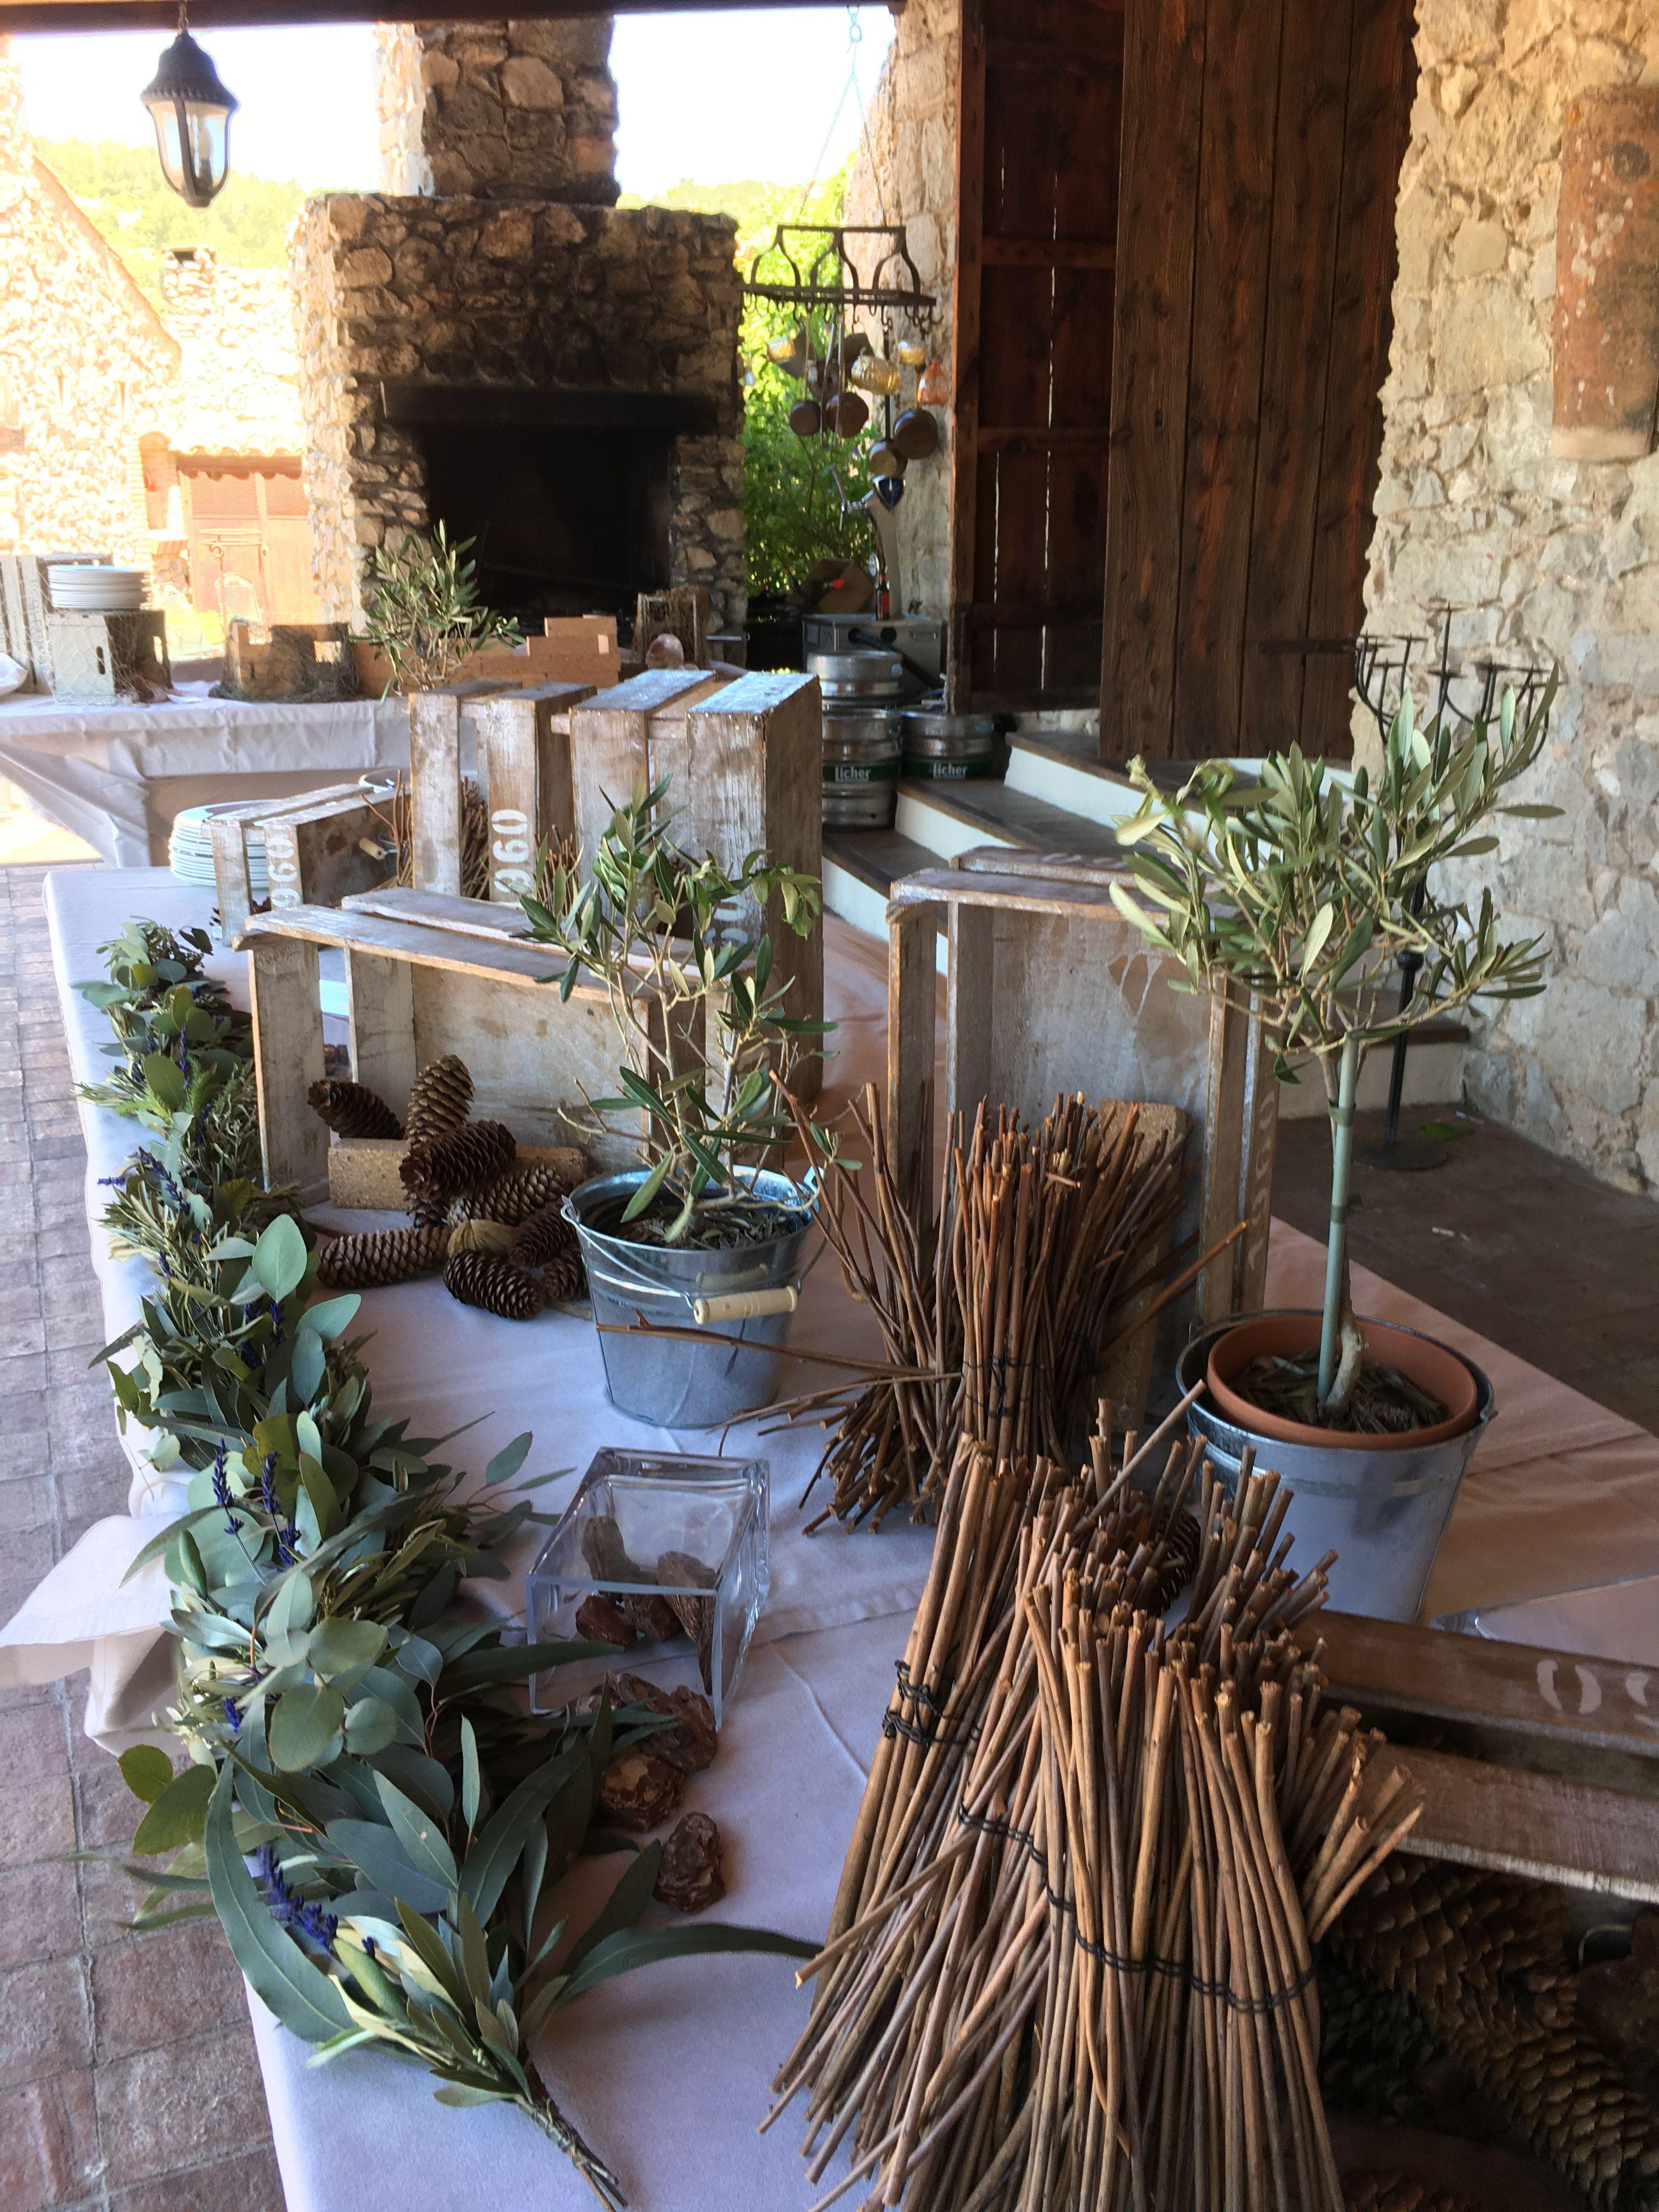 Decoración mesa imperial. Guirnalda de eucaliptos, olivo y lavanda. #garland #greengarland #tabledecoration #wedding #spanishwedding #rusticwedding #casafelix #boda #decoracionboda #sitges #sitgesbodas #weddingsitges #mediterraneanwedding